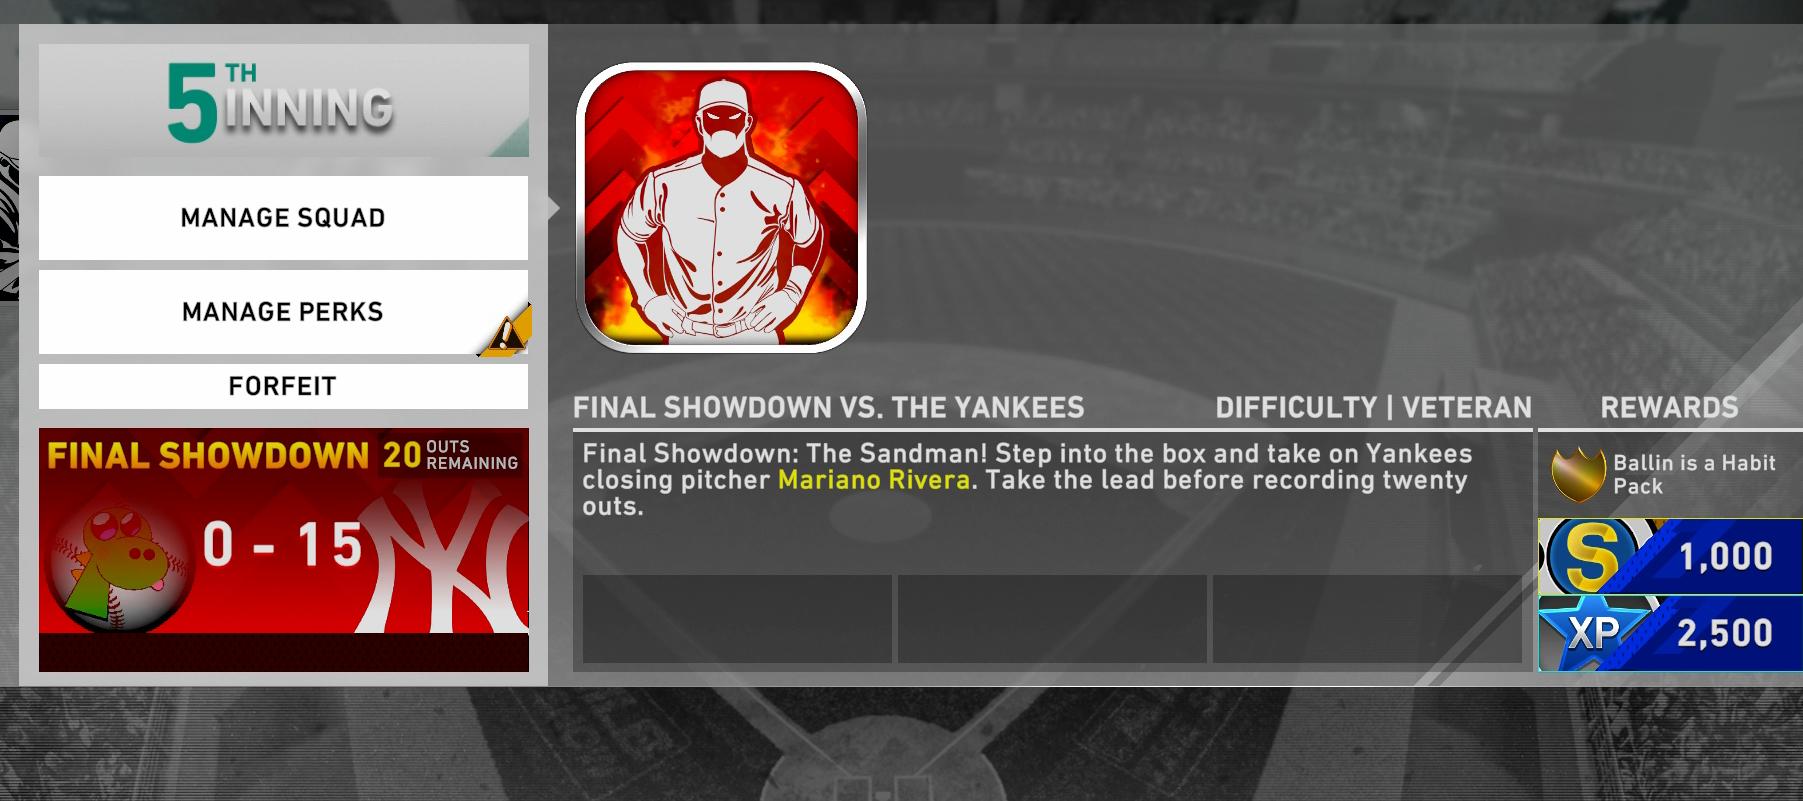 5th-inning-program-showdown